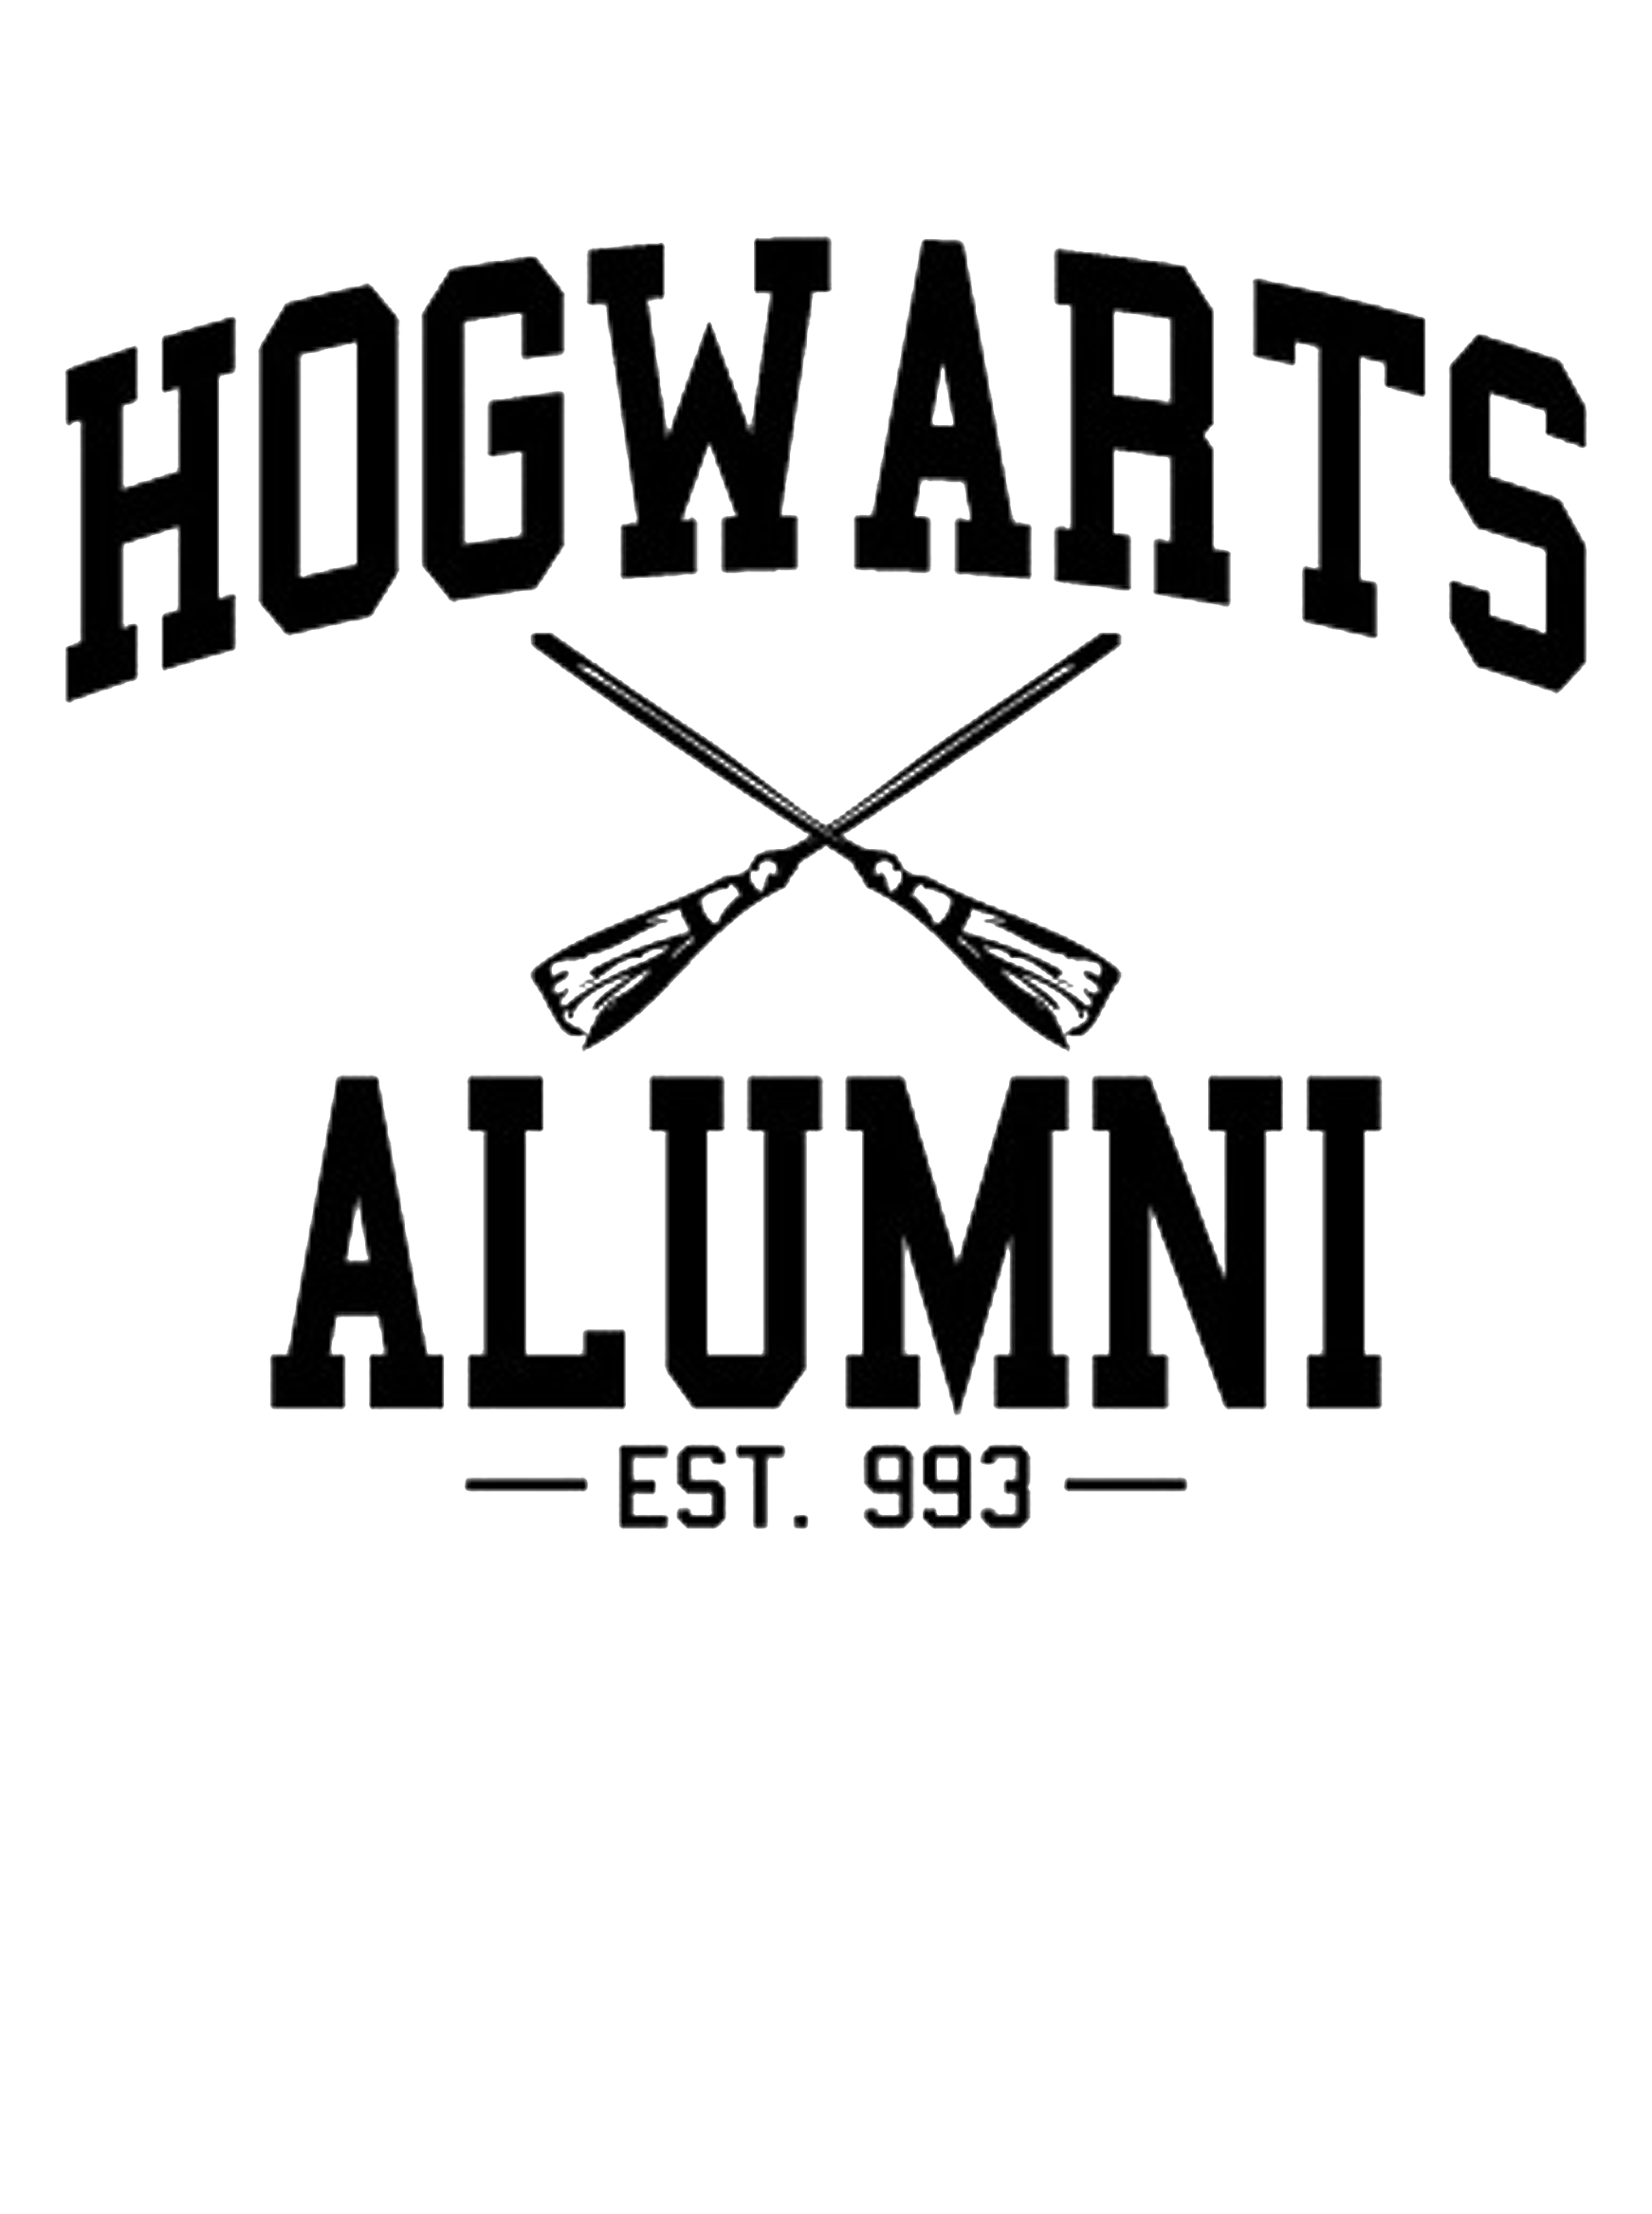 Hogwarts Alumni Harry potter car, Hogwarts alumni, Harry